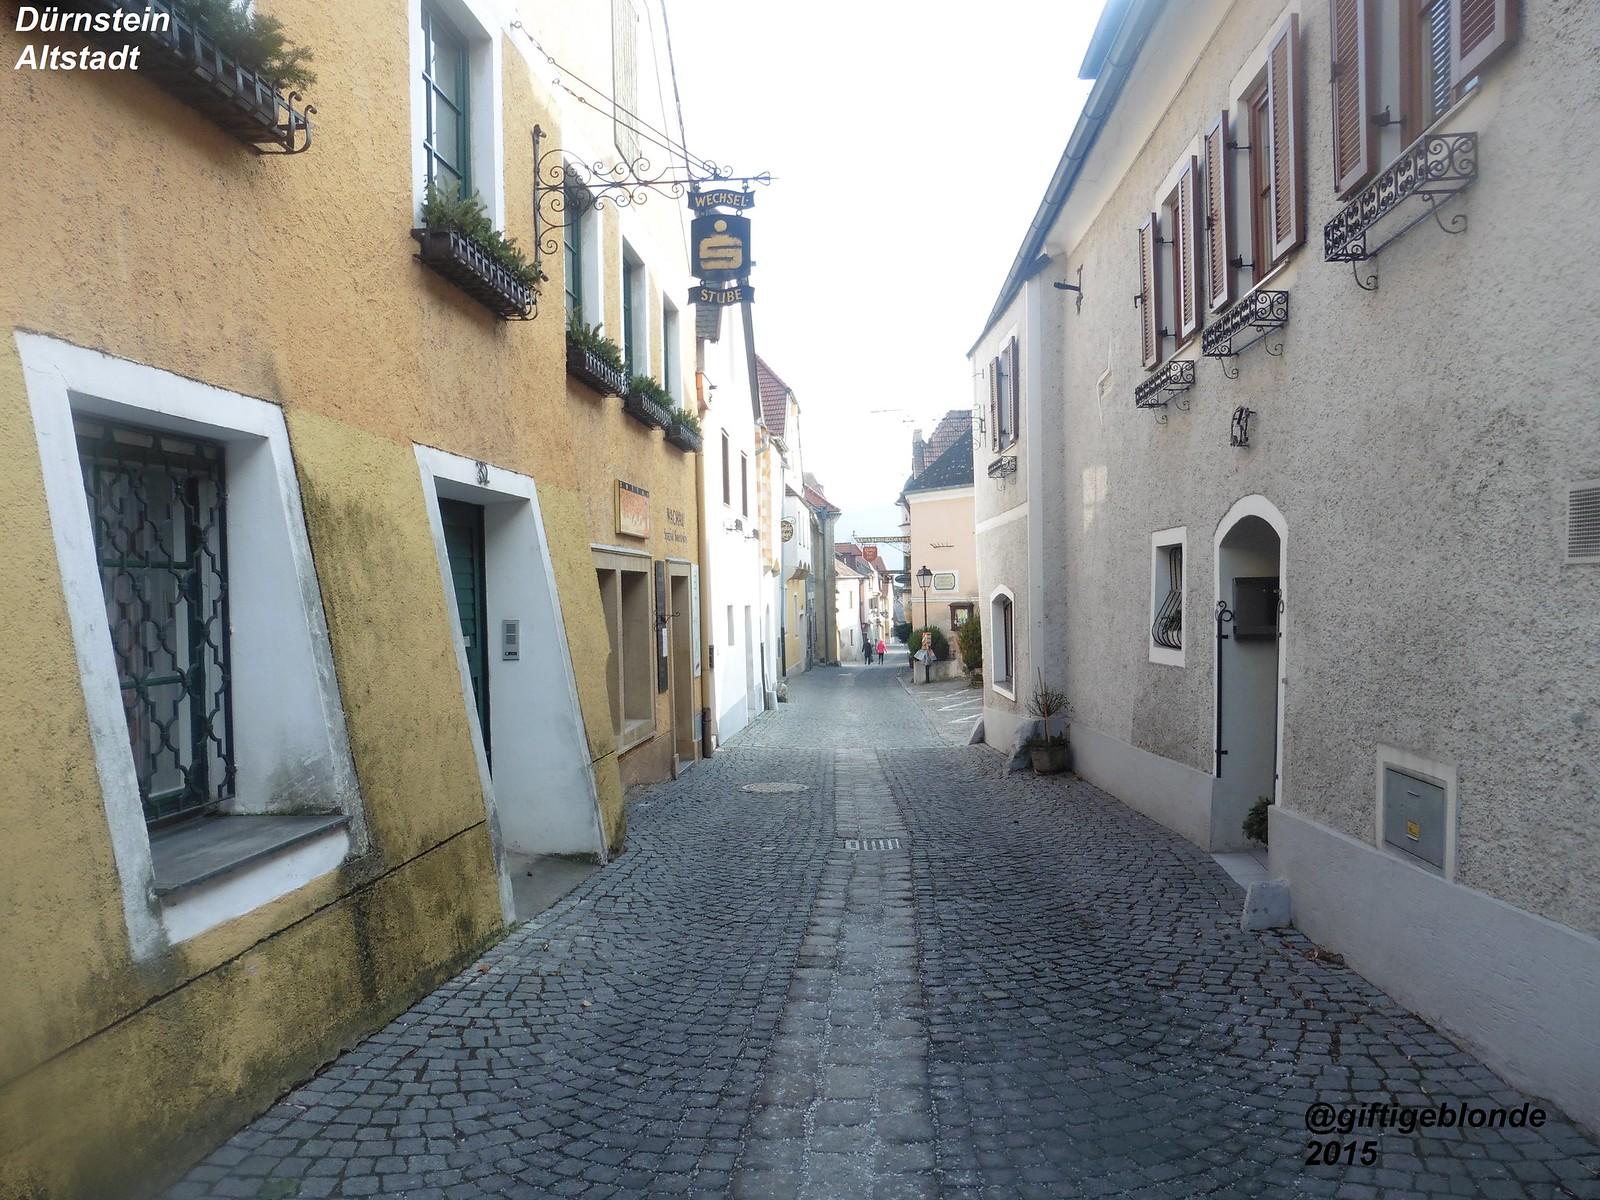 Dürnstein Altstadt